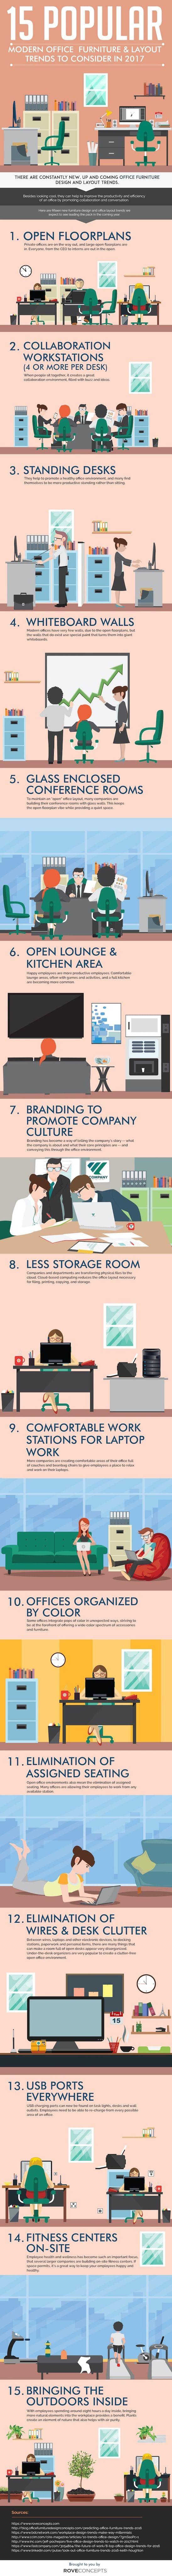 15 popular #office #trends 2017 | t3n